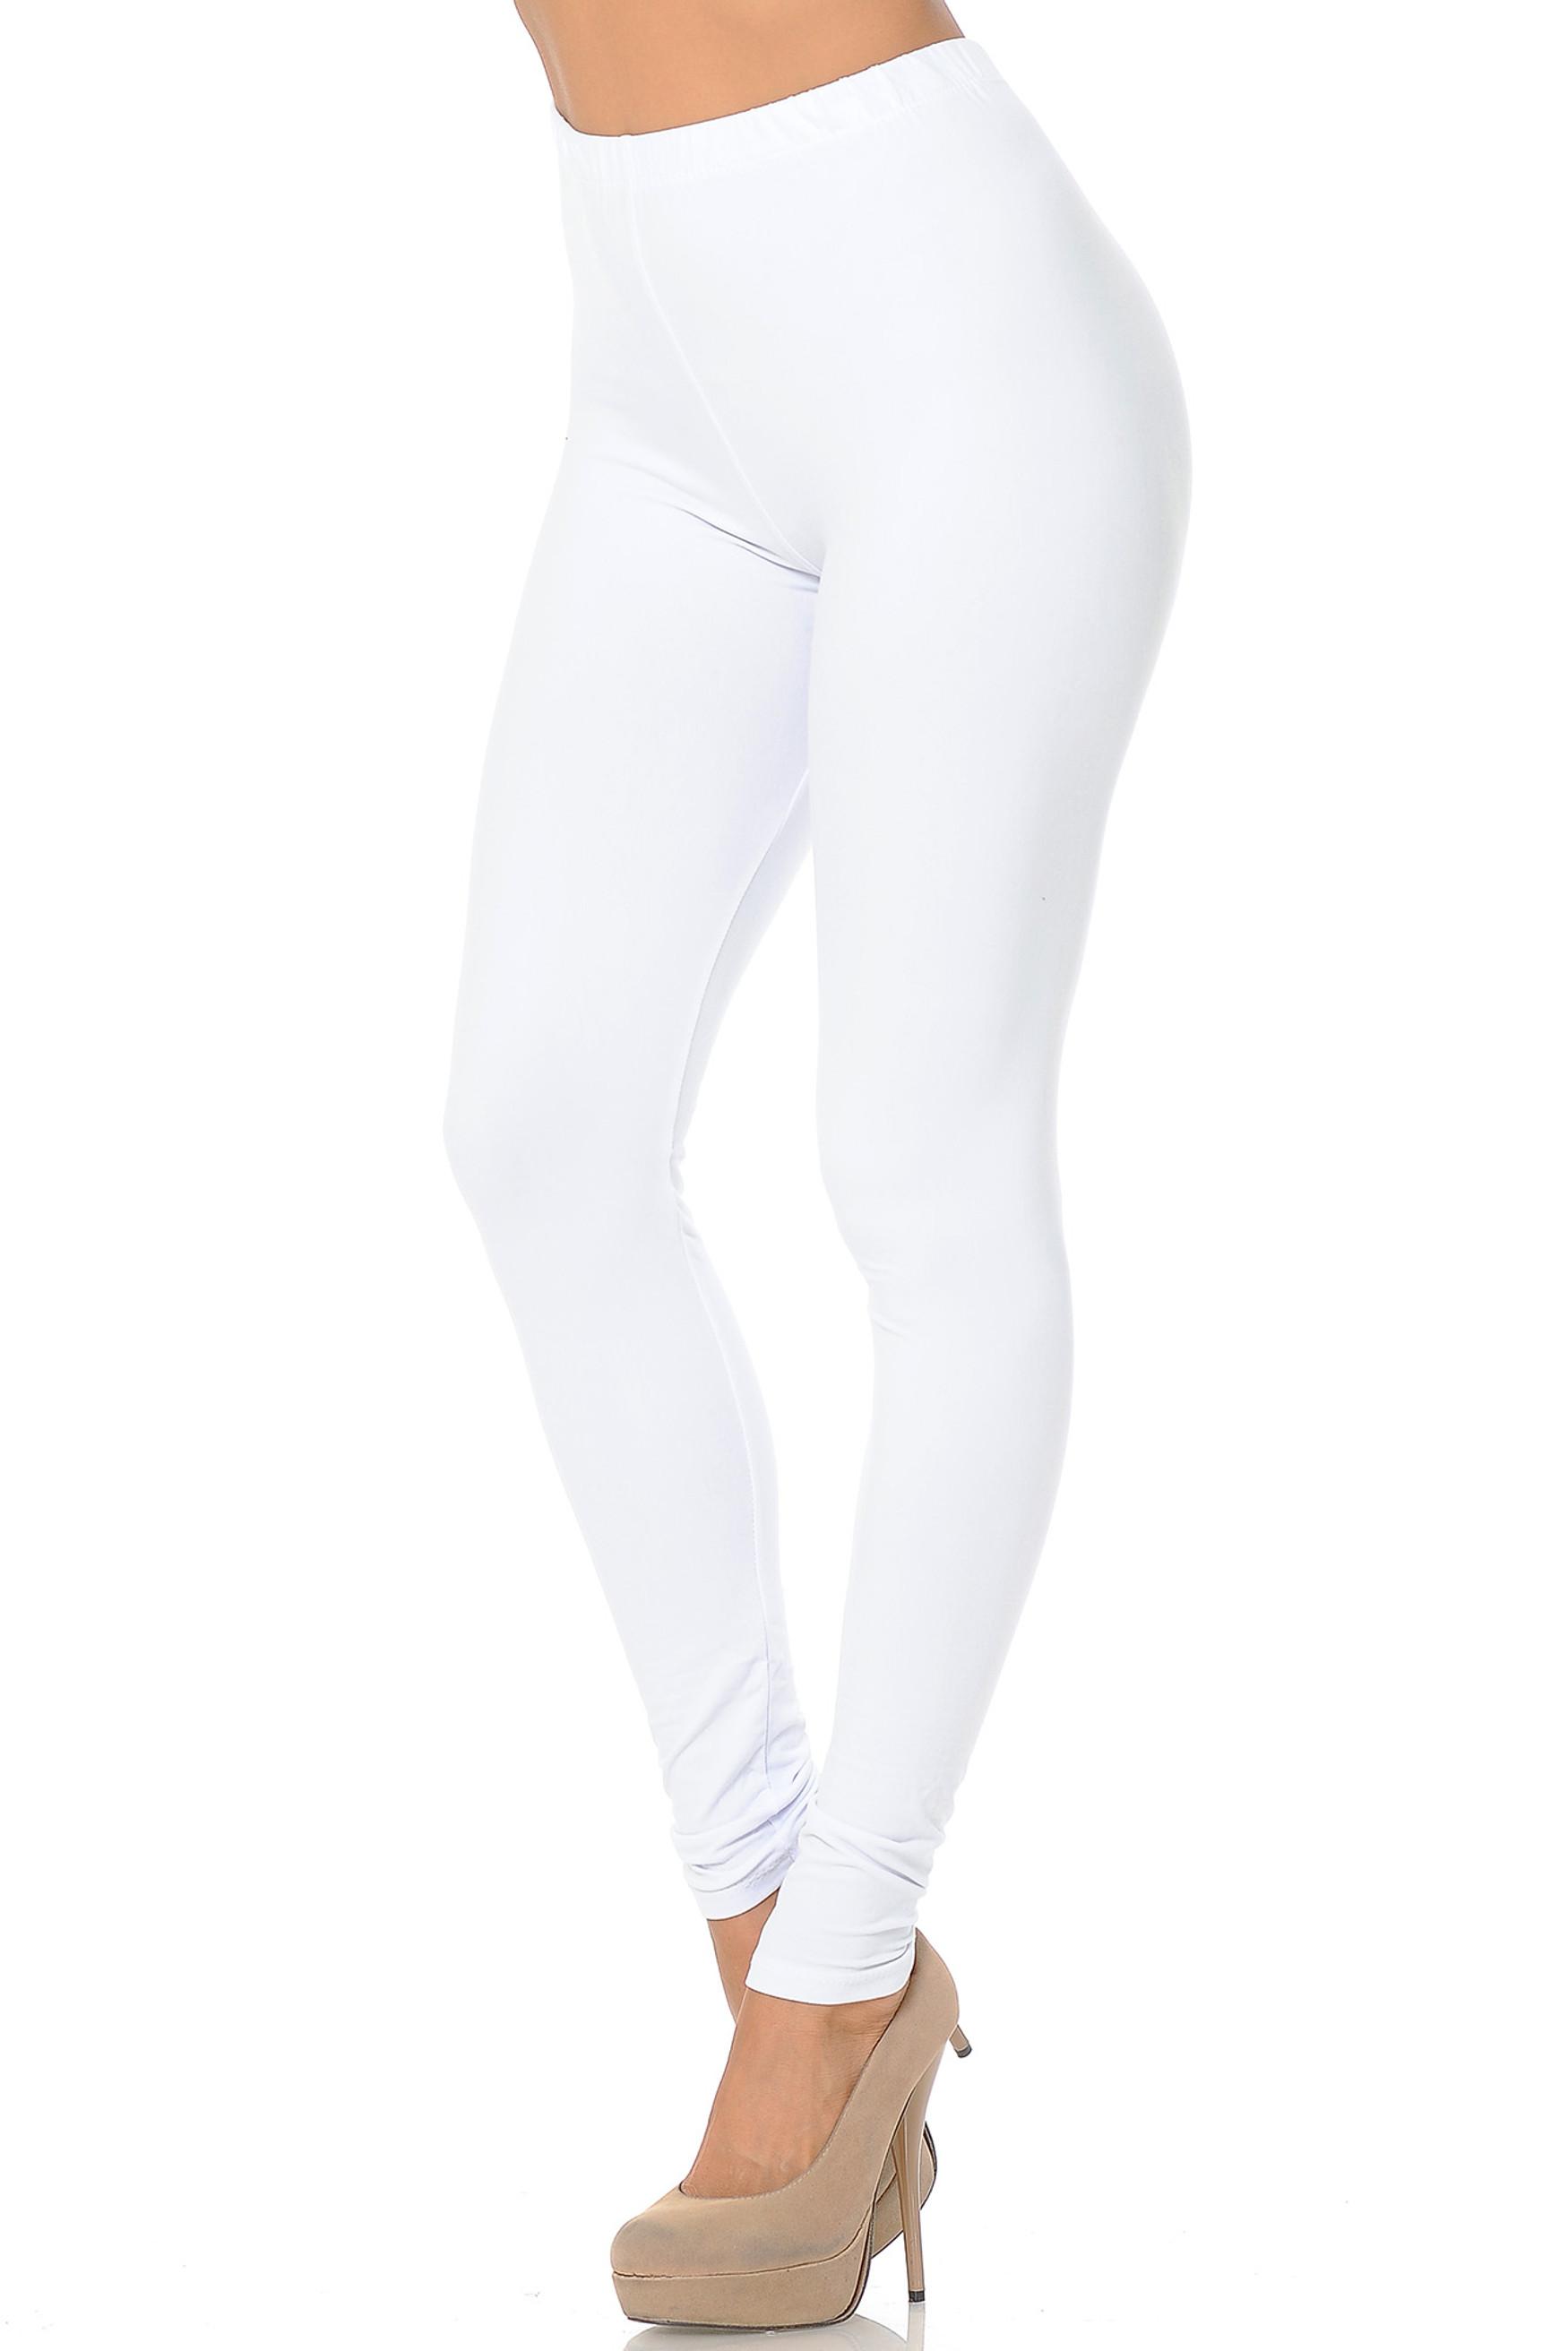 White Brushed Basic Solid Leggings - EEVEE